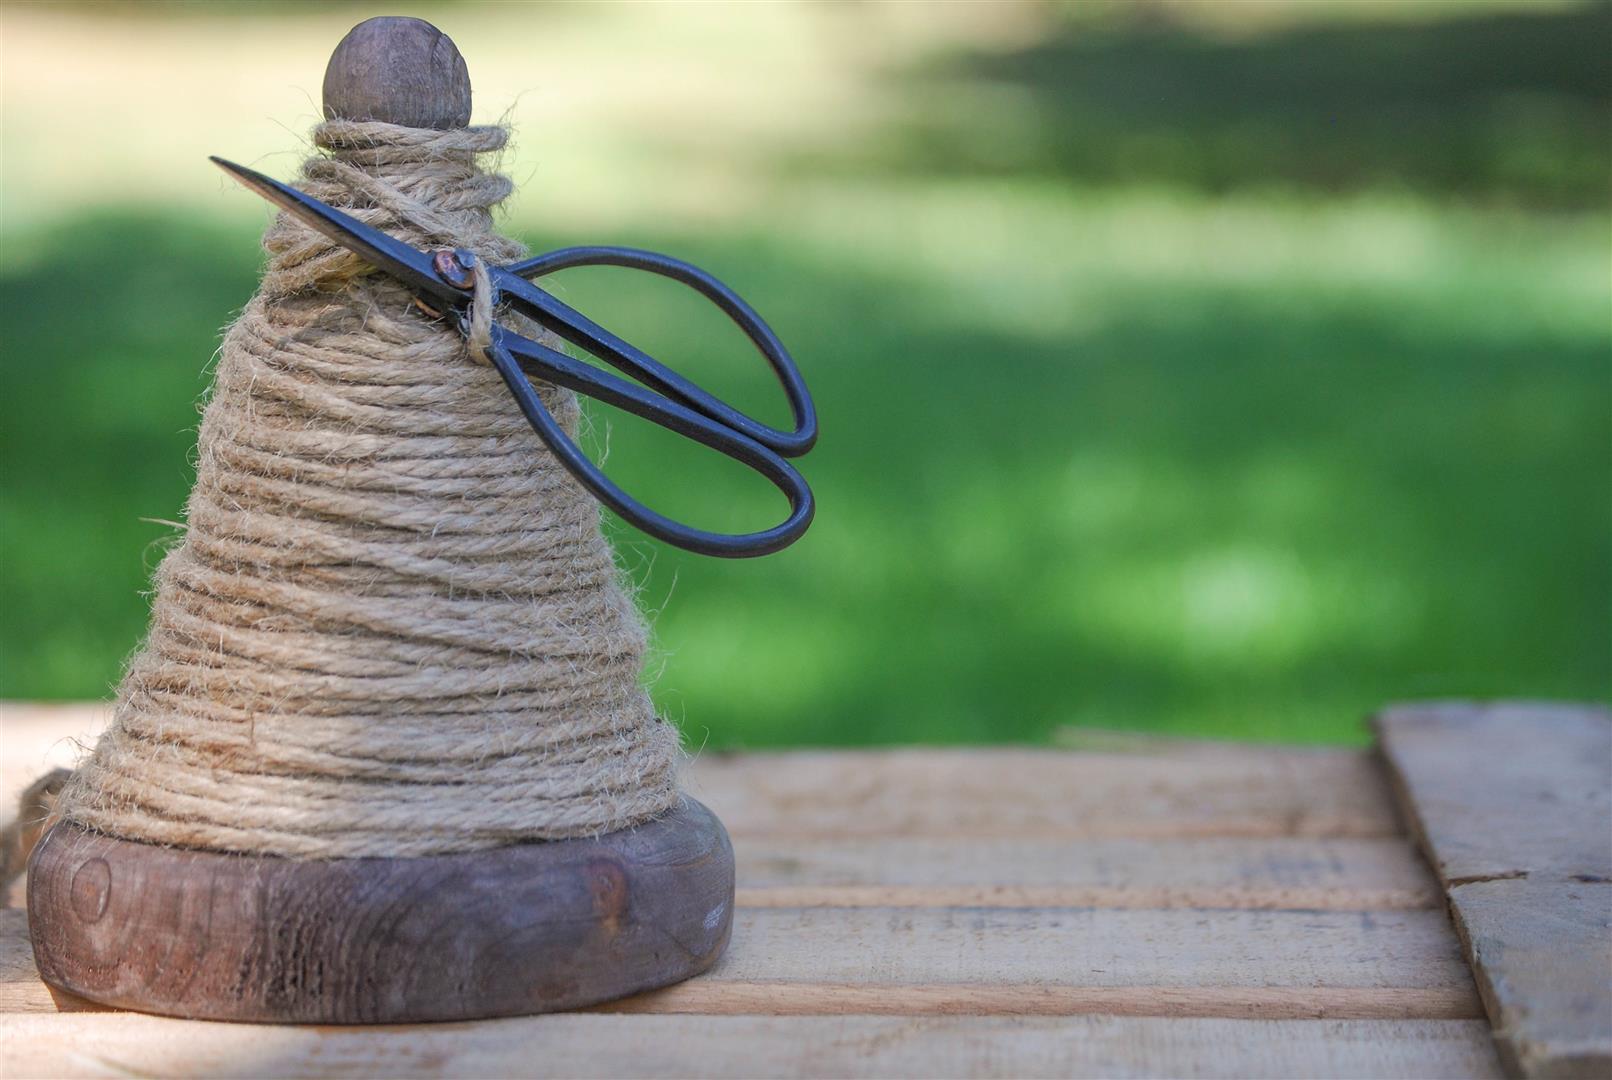 bobina-madera-cordon-cuerda-rustico-tijeras (5)